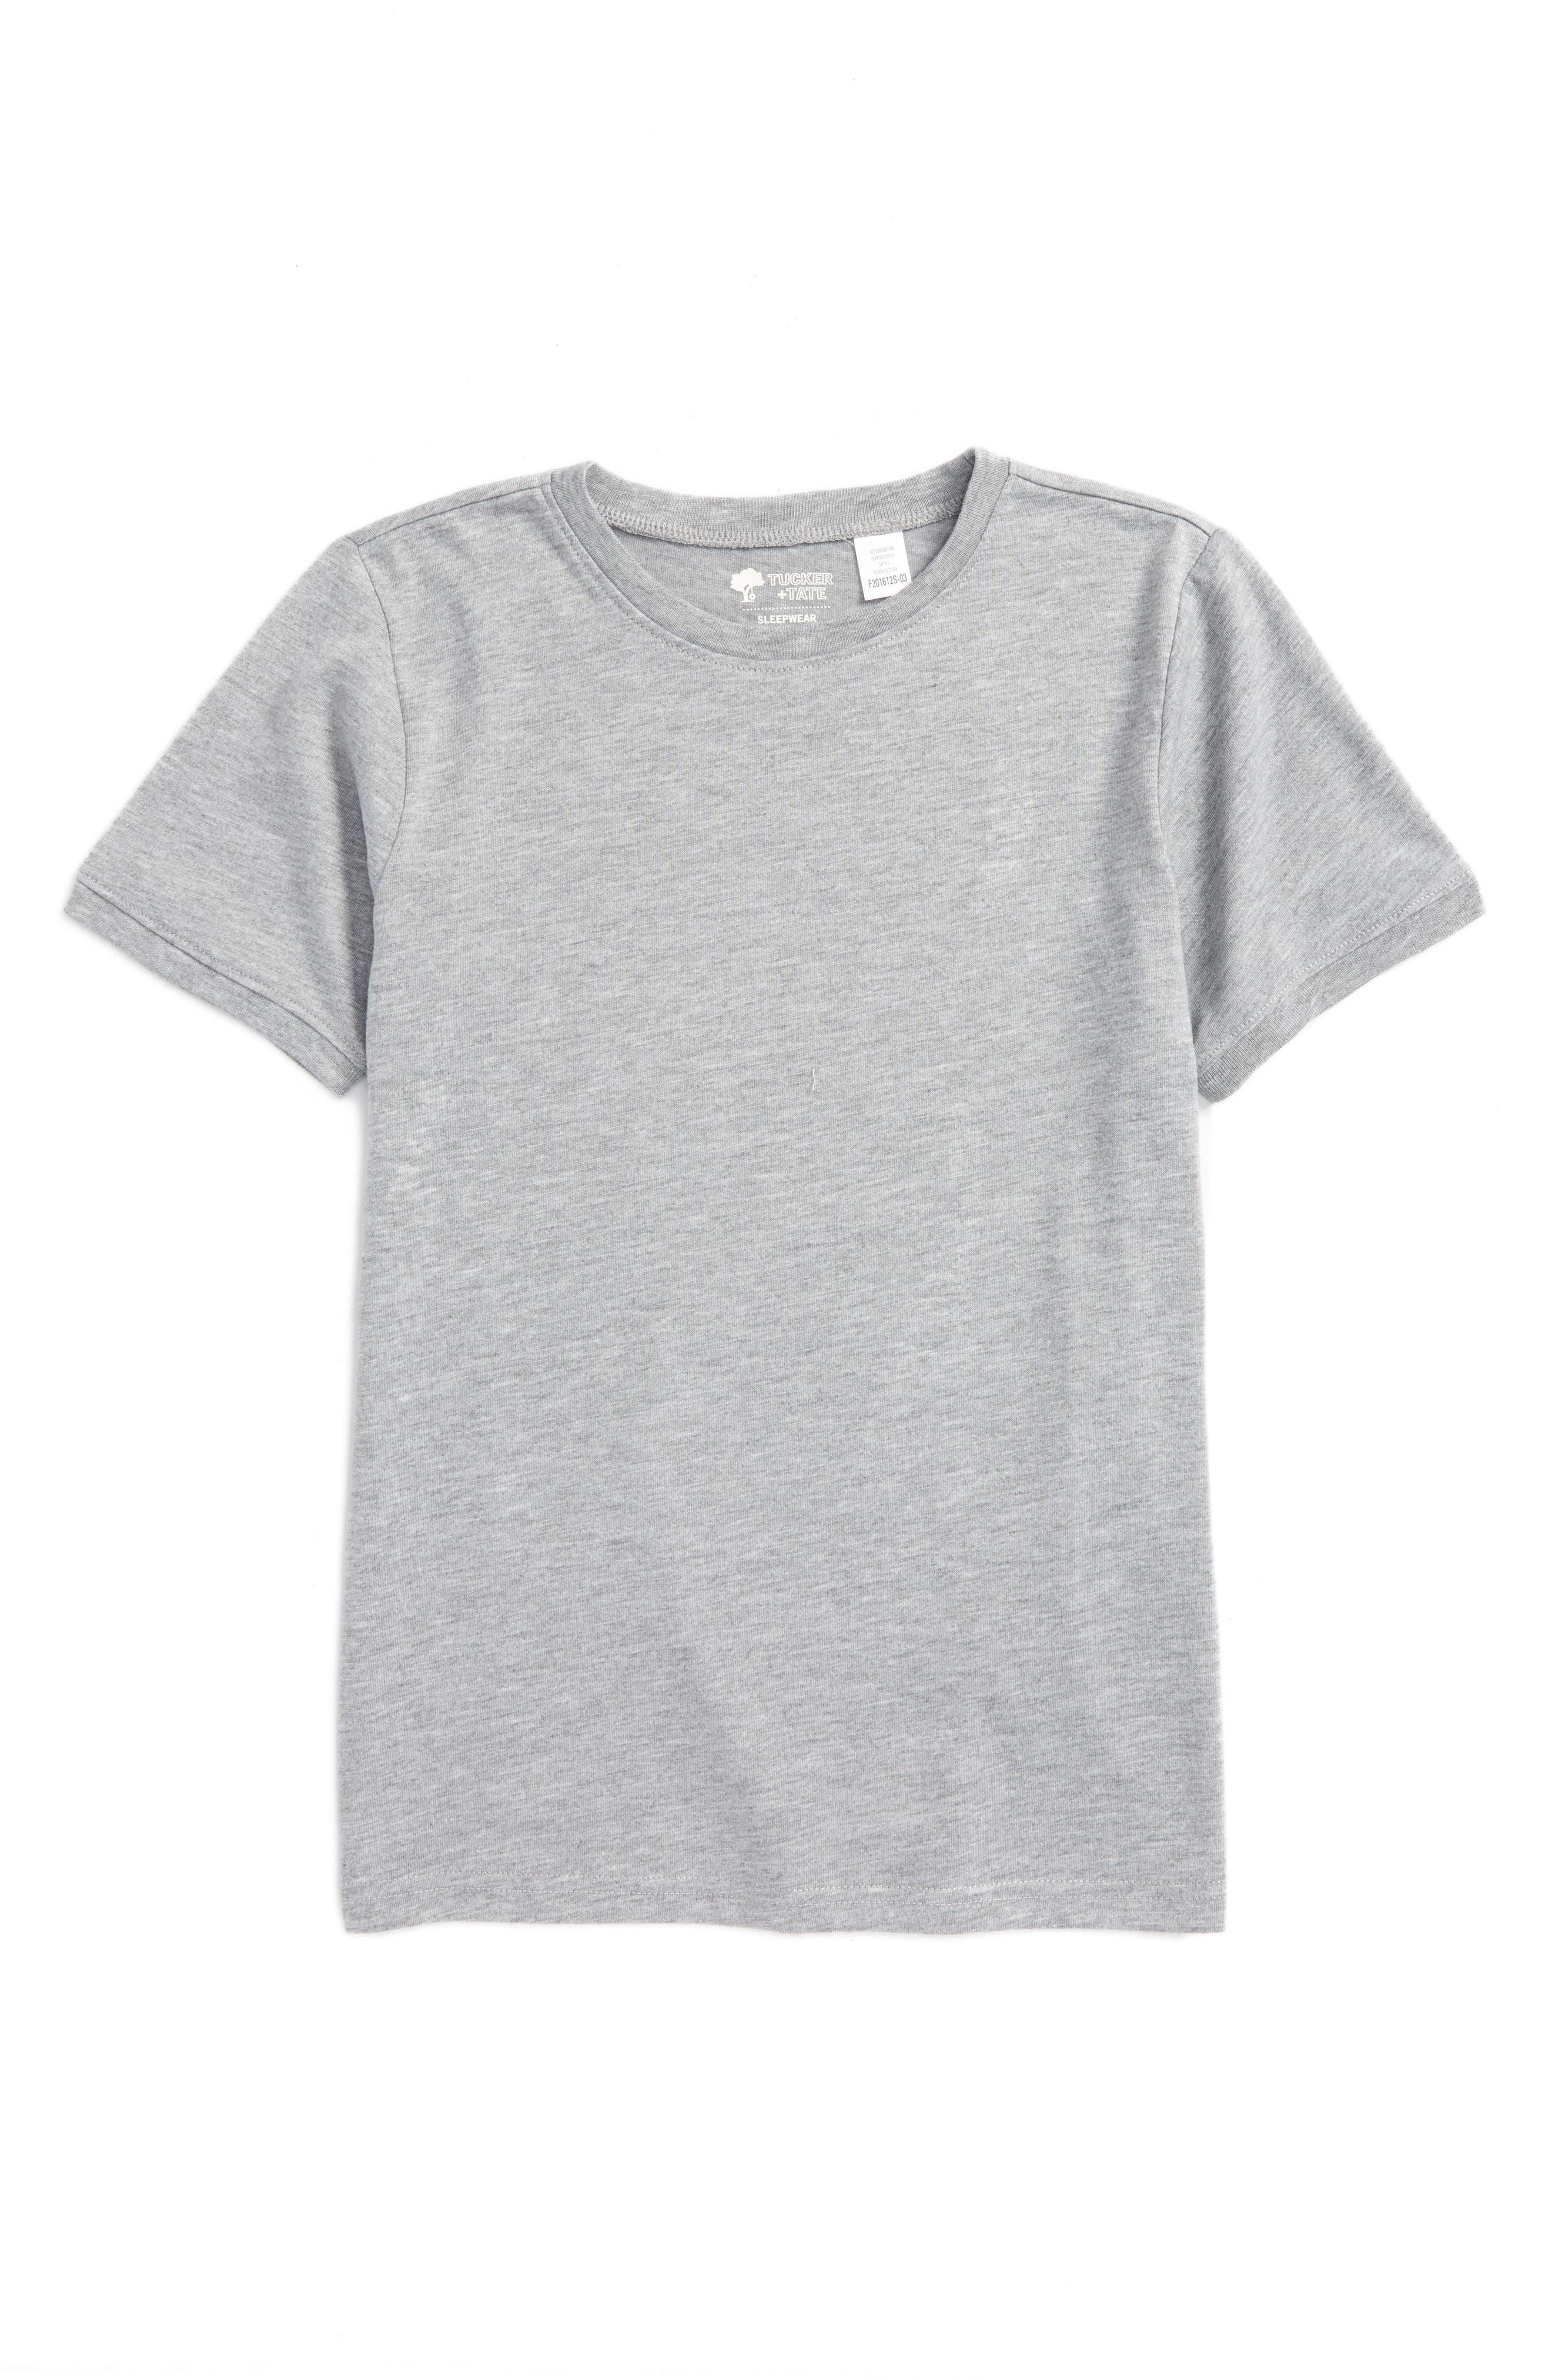 Sleep T-Shirt,                         Main,                         color, 030